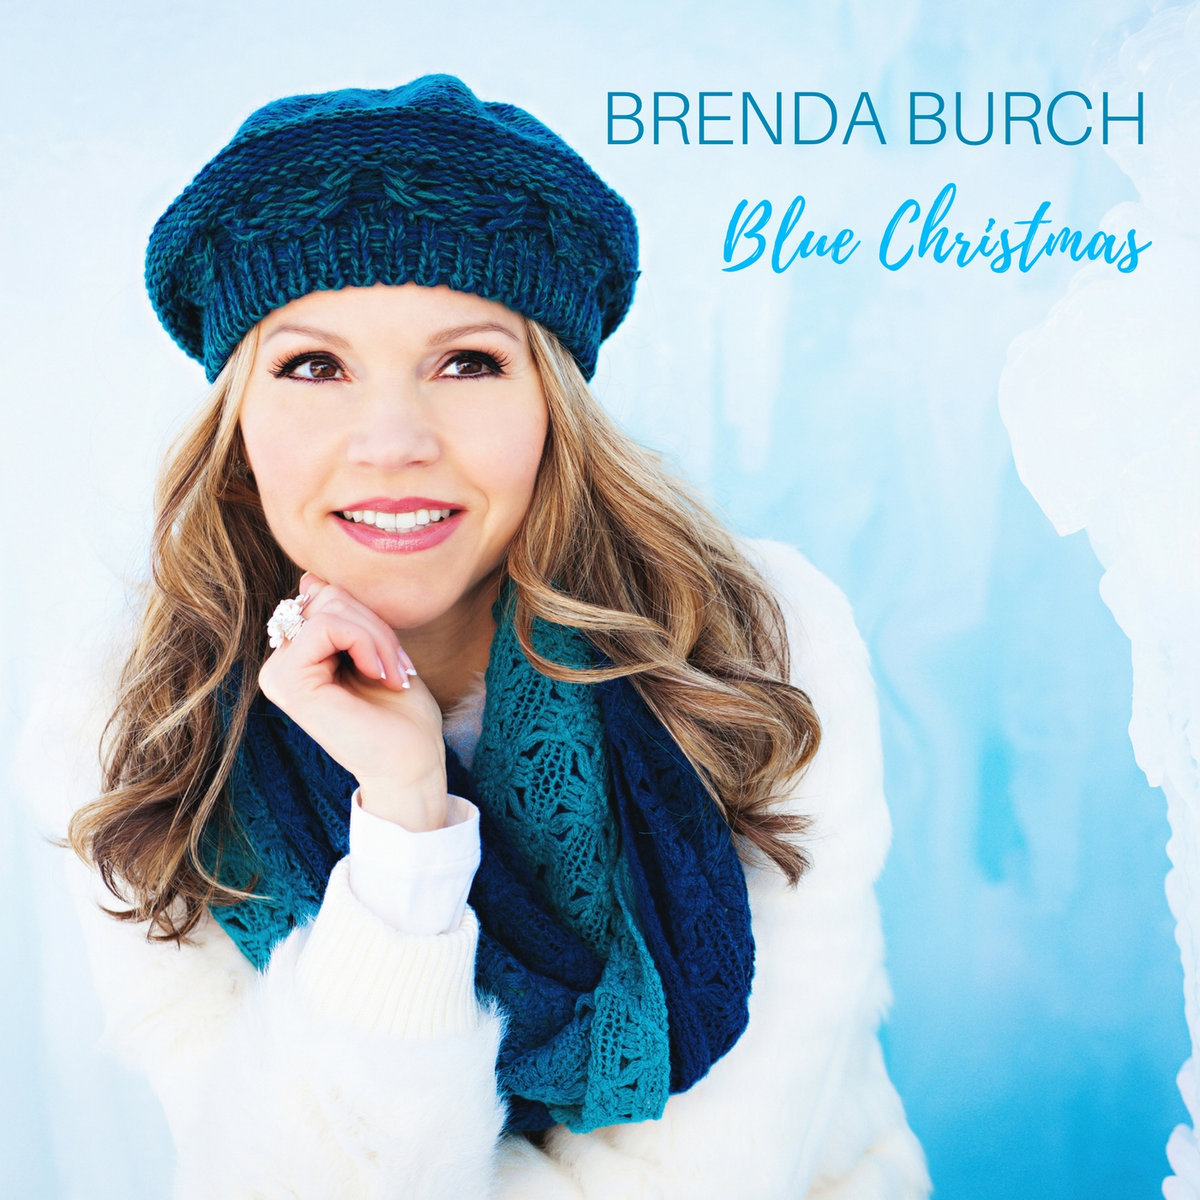 Blue Christmas by Brenda Burch